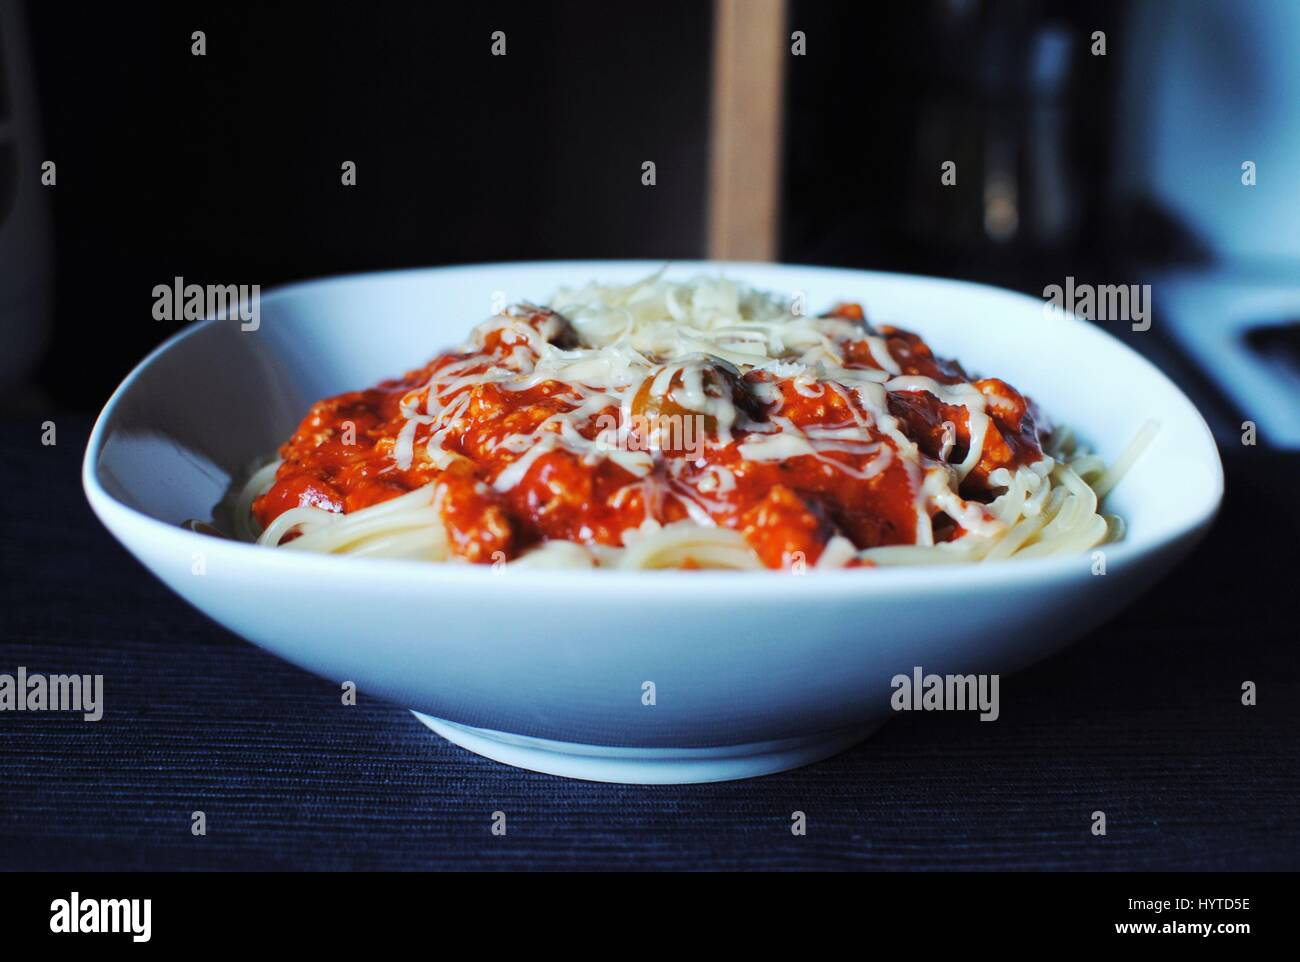 Leckere Spaghetti Bolognese mit Oliven und Mozzarella-Käse auf dunklem Hintergrund. Stockbild